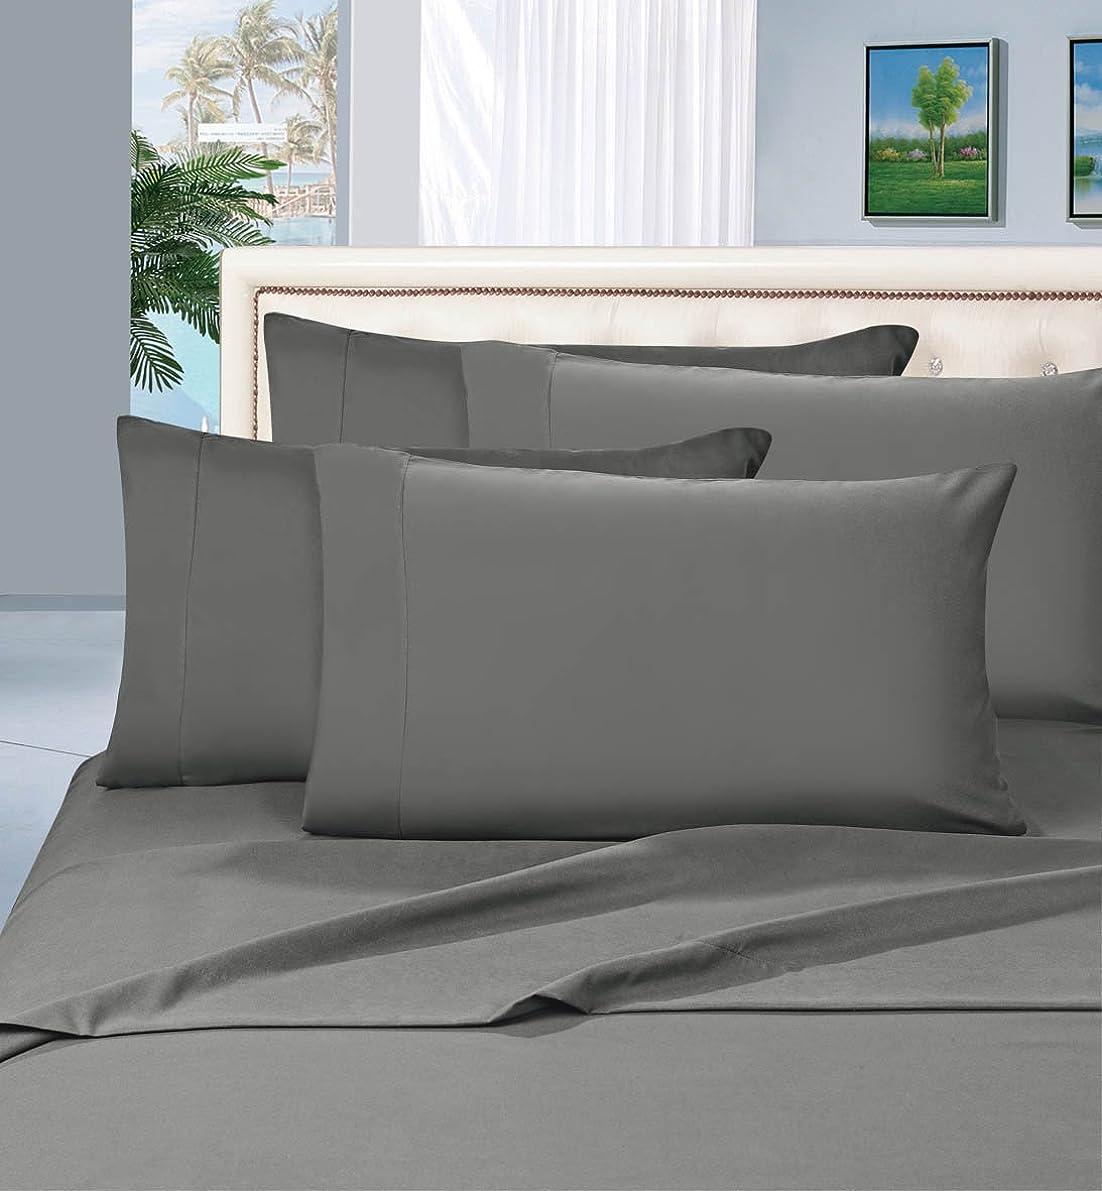 Elegant Comfort 2 Piece Luxurious Silky-Soft Pillowcases, Standard, Gray